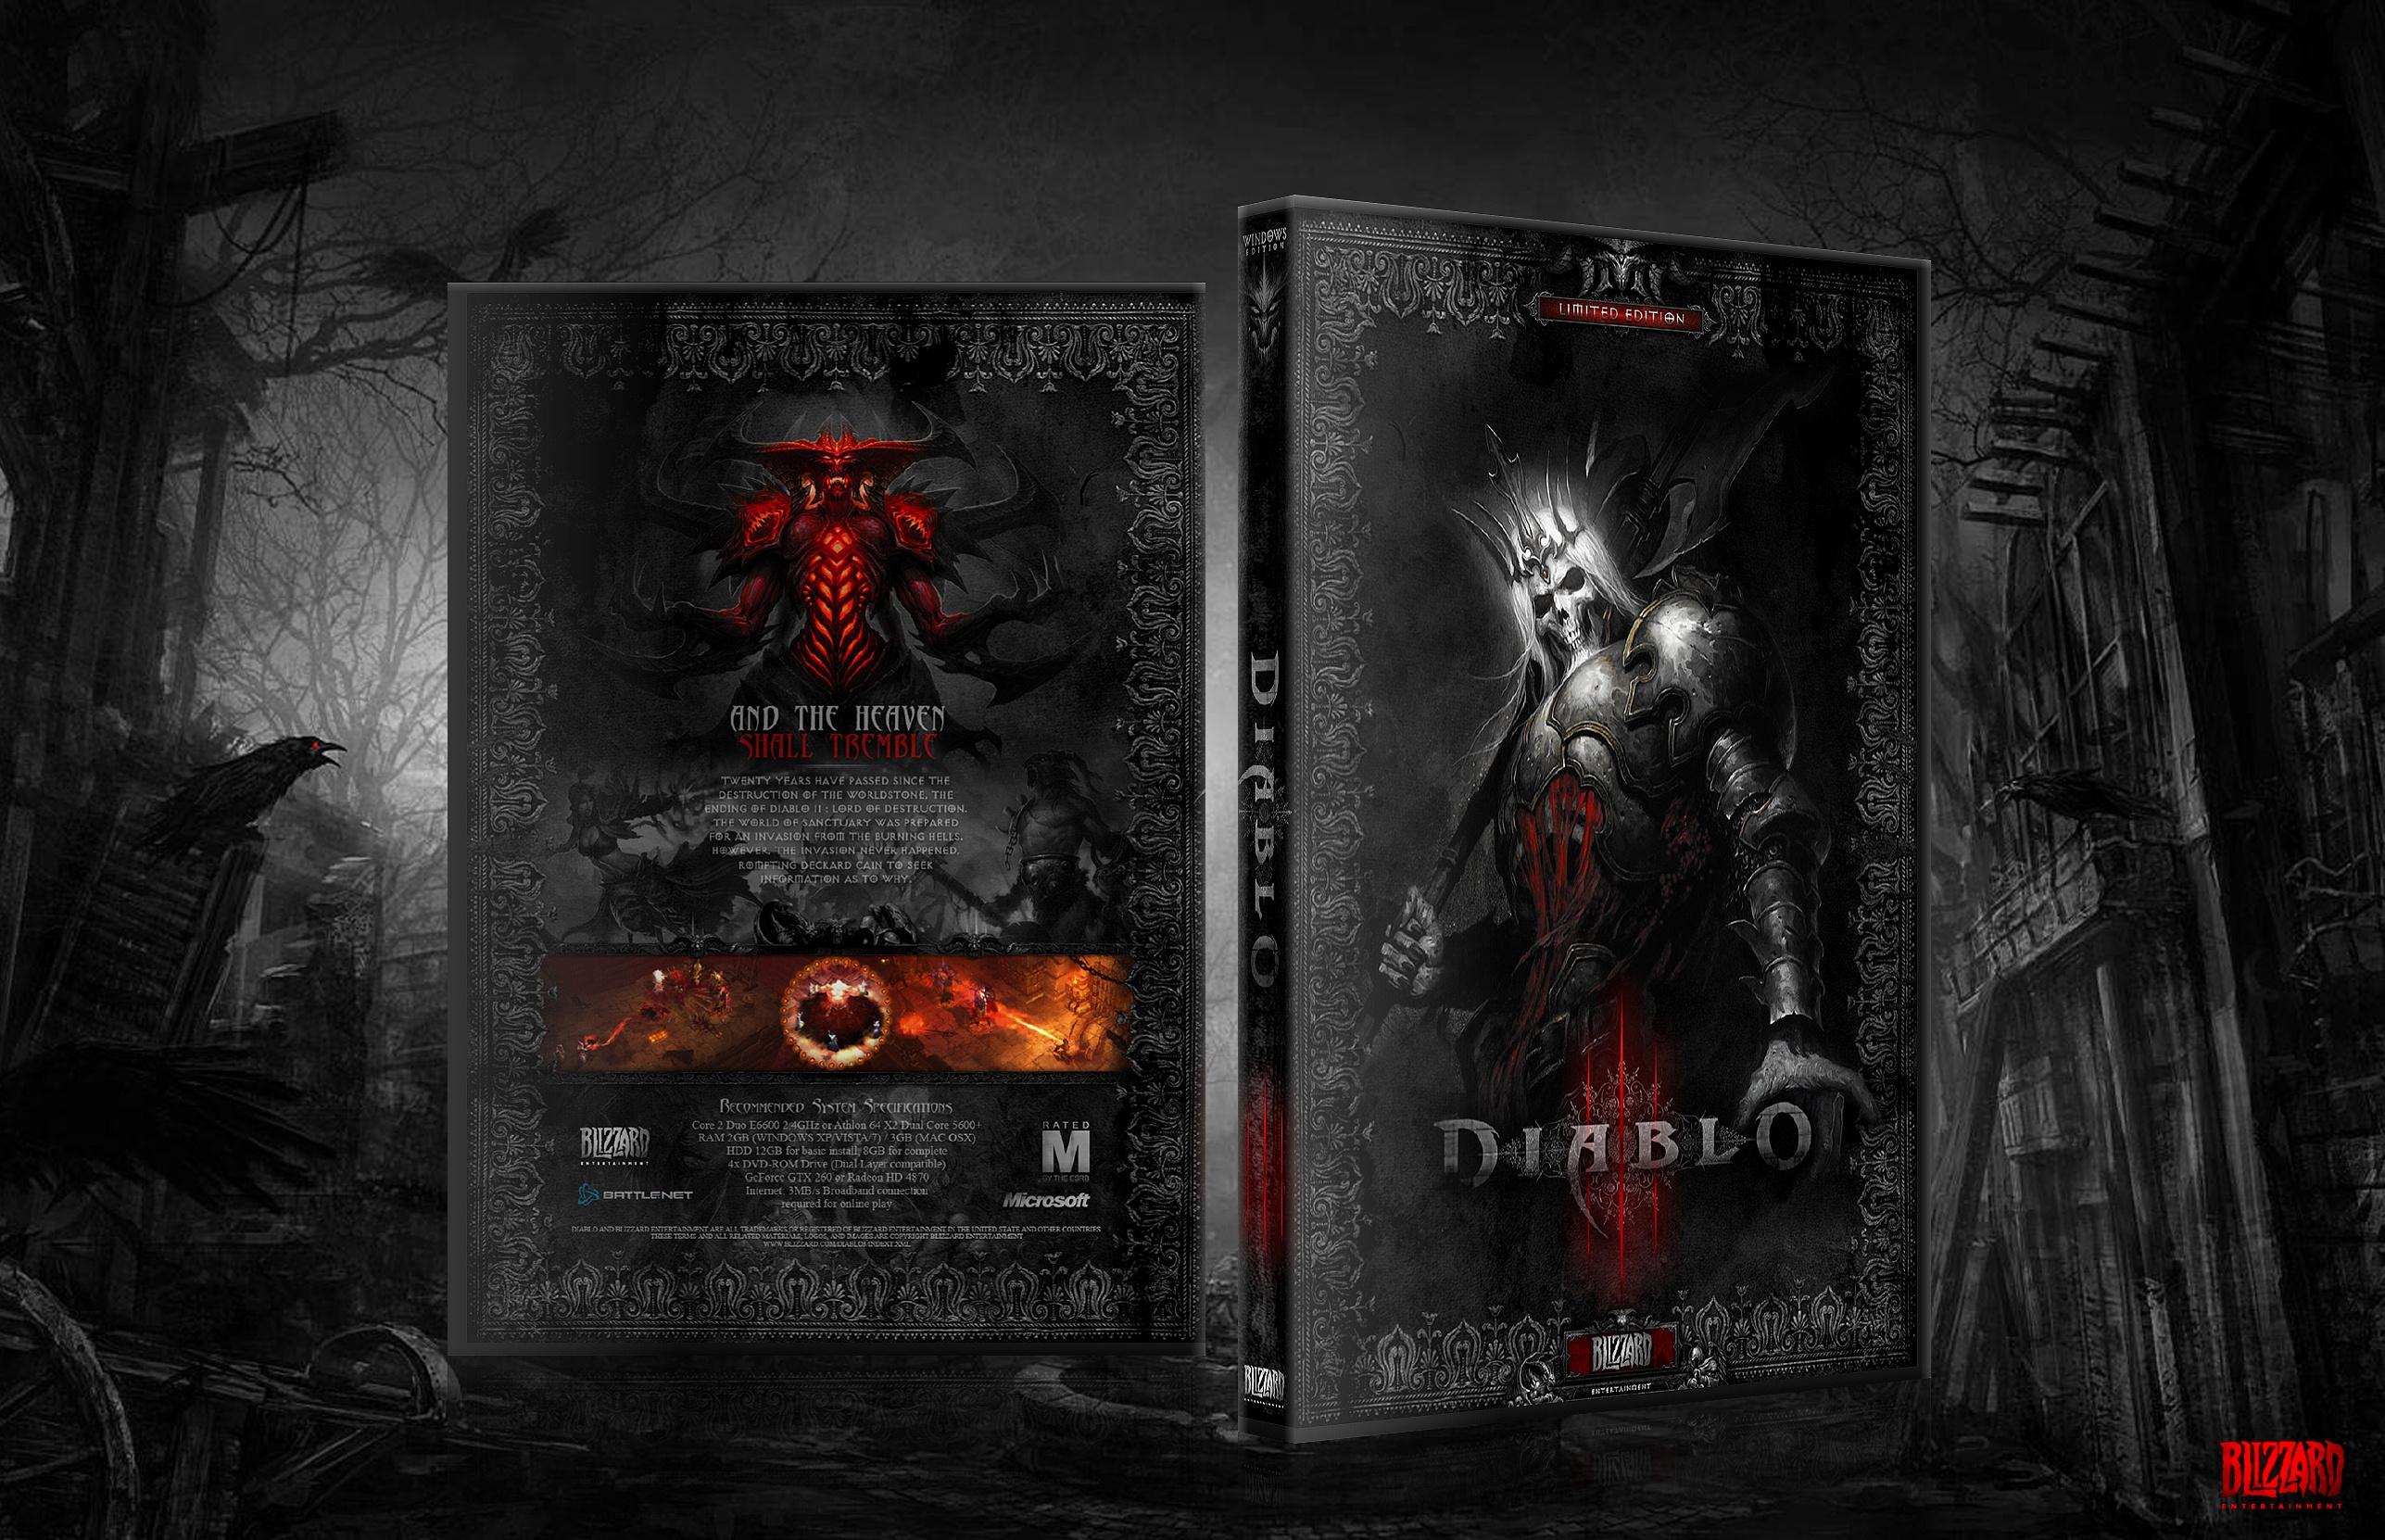 Diablo 3 Activation Codes: Software Free Download - filecloudshoe